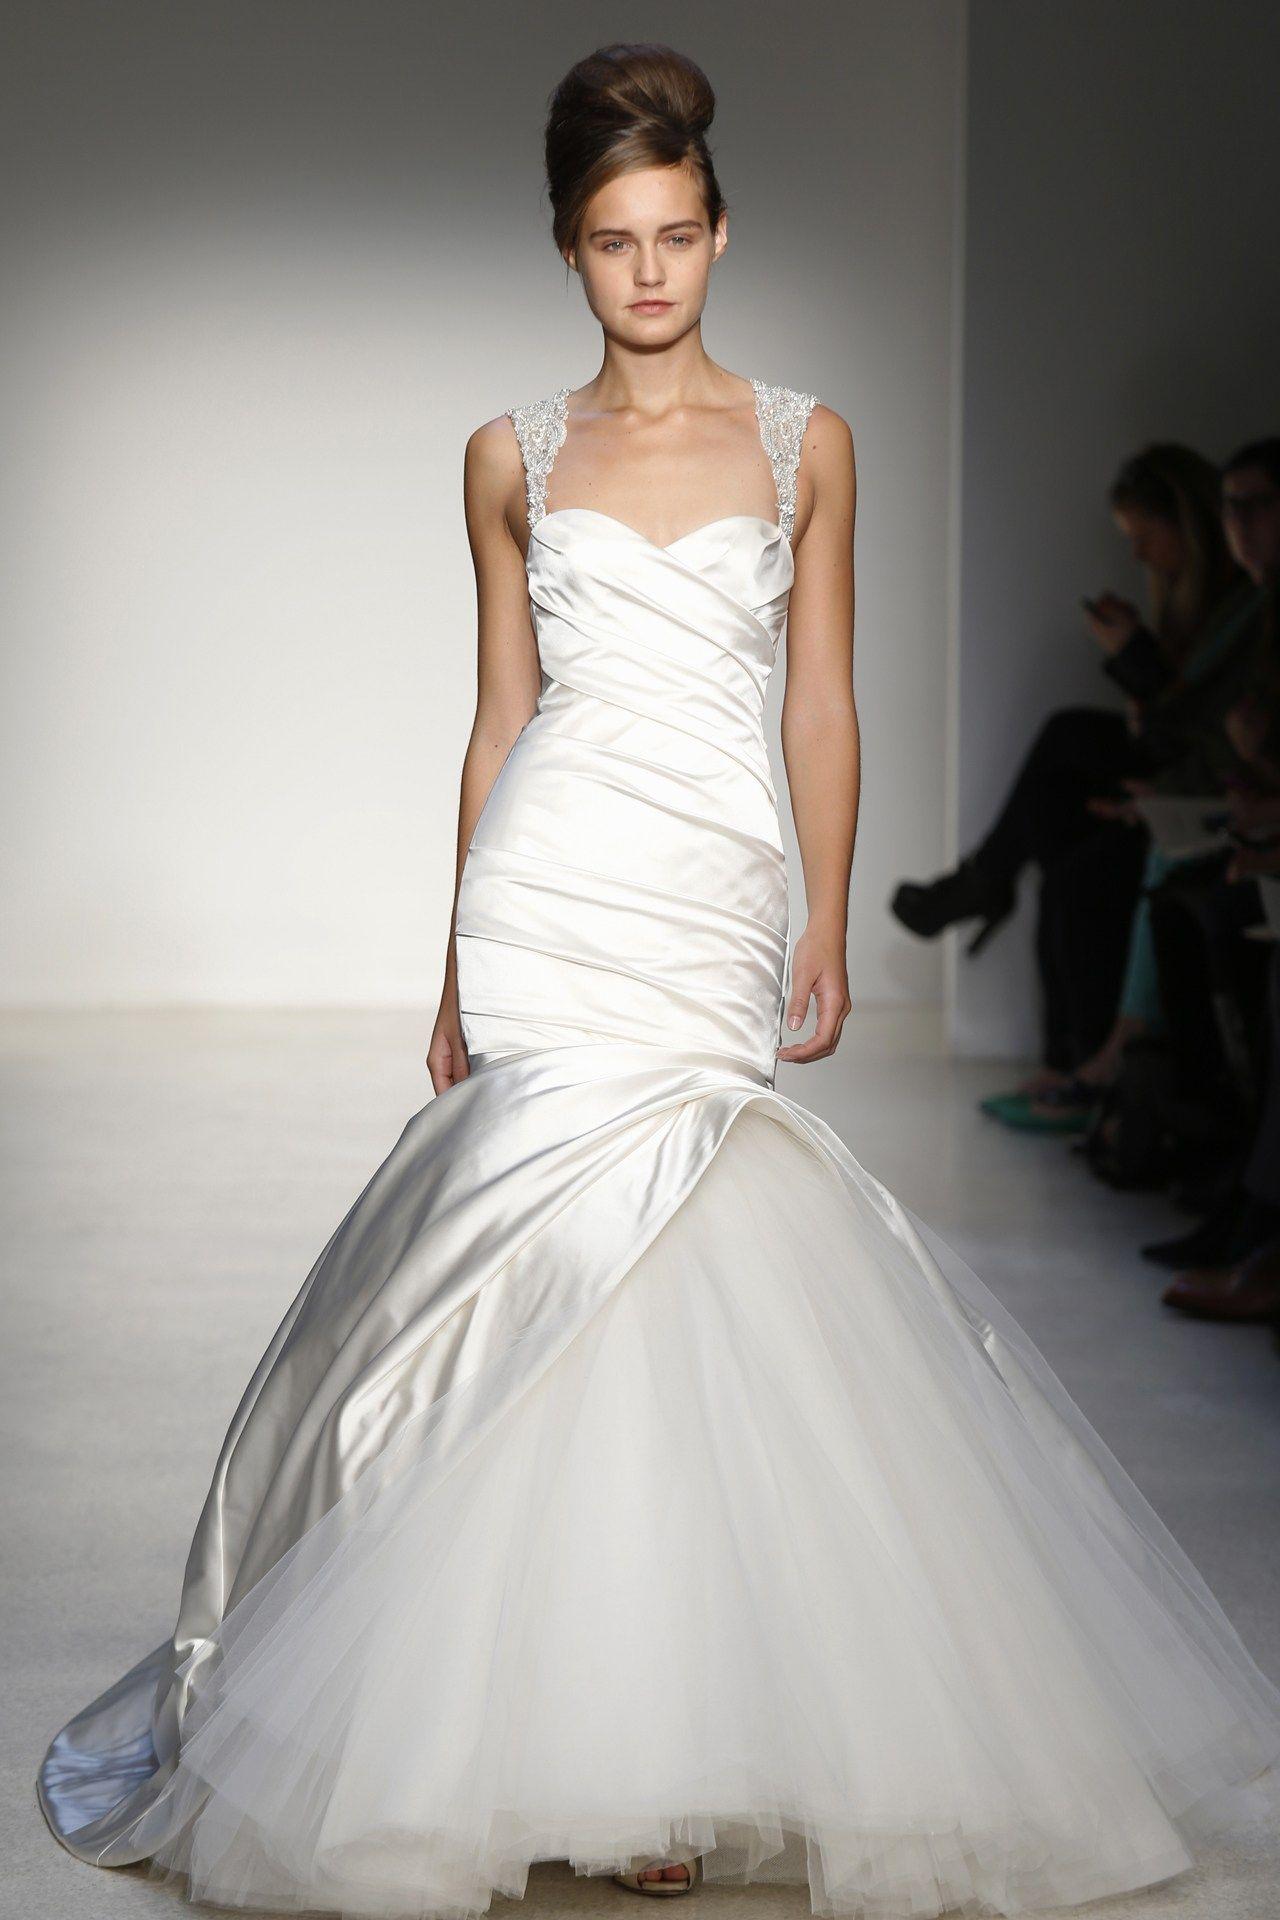 Kenneth Pool - Bridal Fall 2013    TAGS:Fishtail, Floor-length, Straps, Cream, Kenneth Pool, Satin, Silk, Elegant, Princess